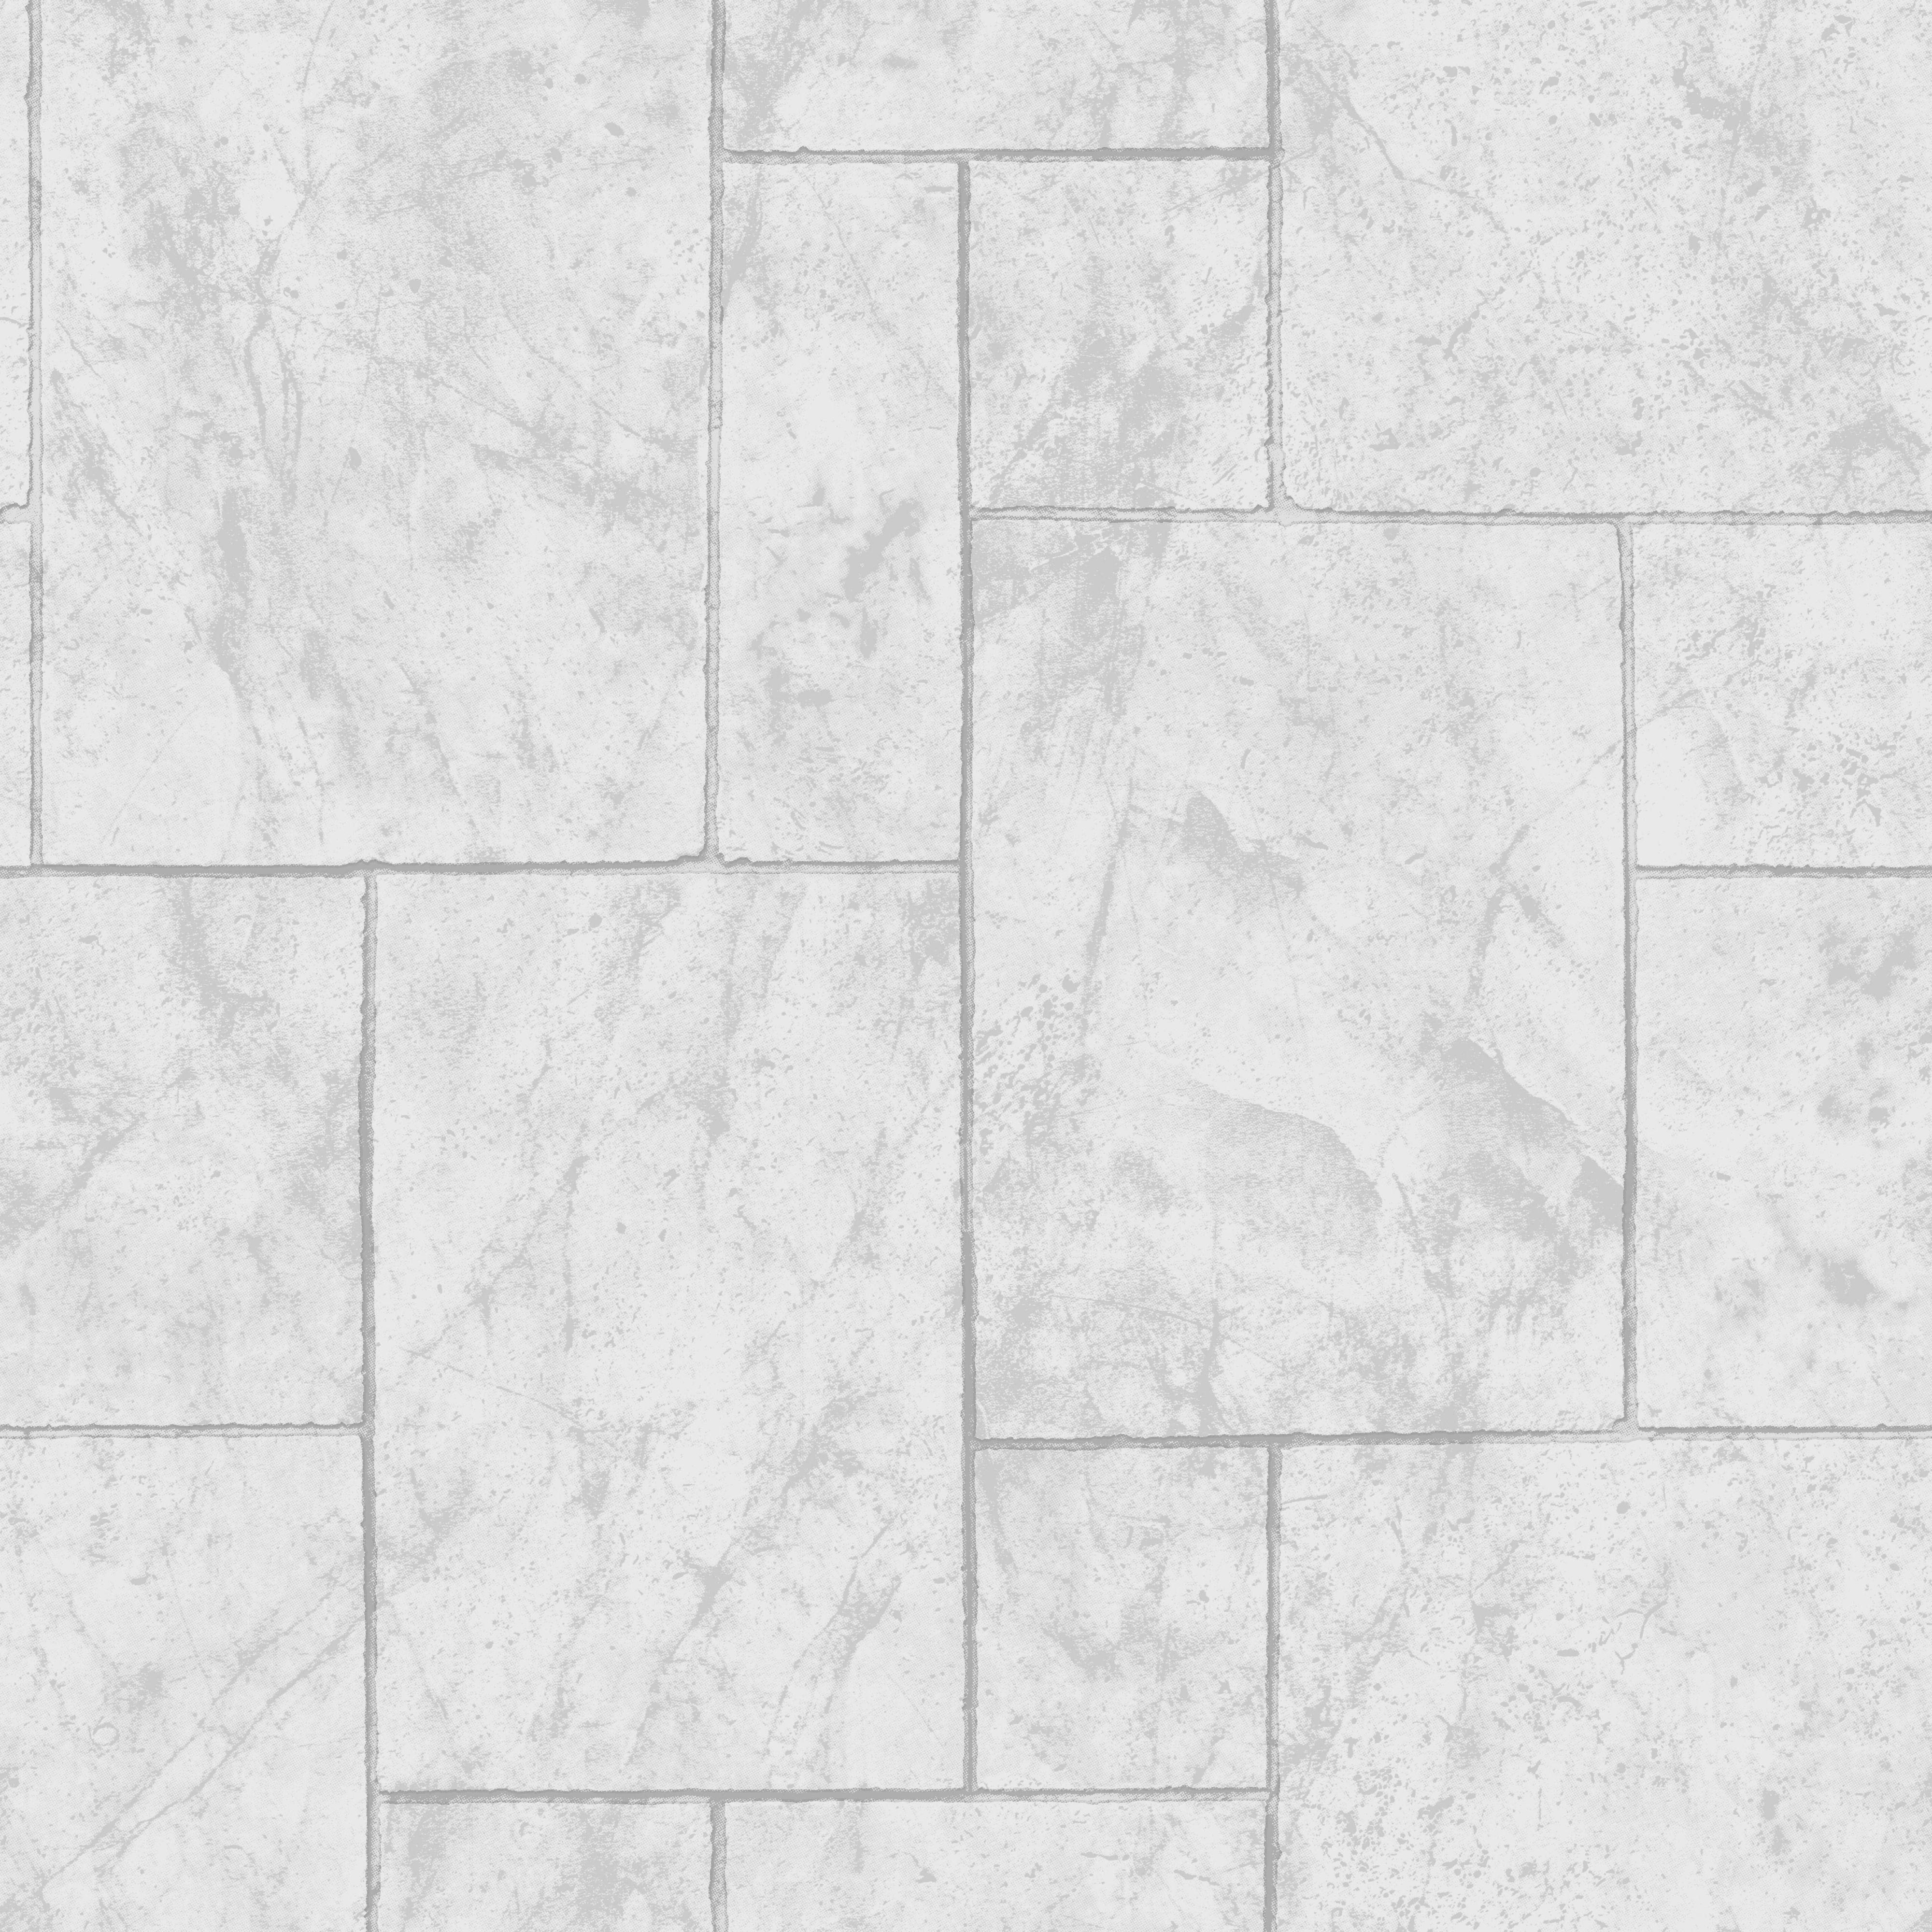 Graham Brown Contour Grey Travertine Tile Kitchen Bathroom Wallpaper